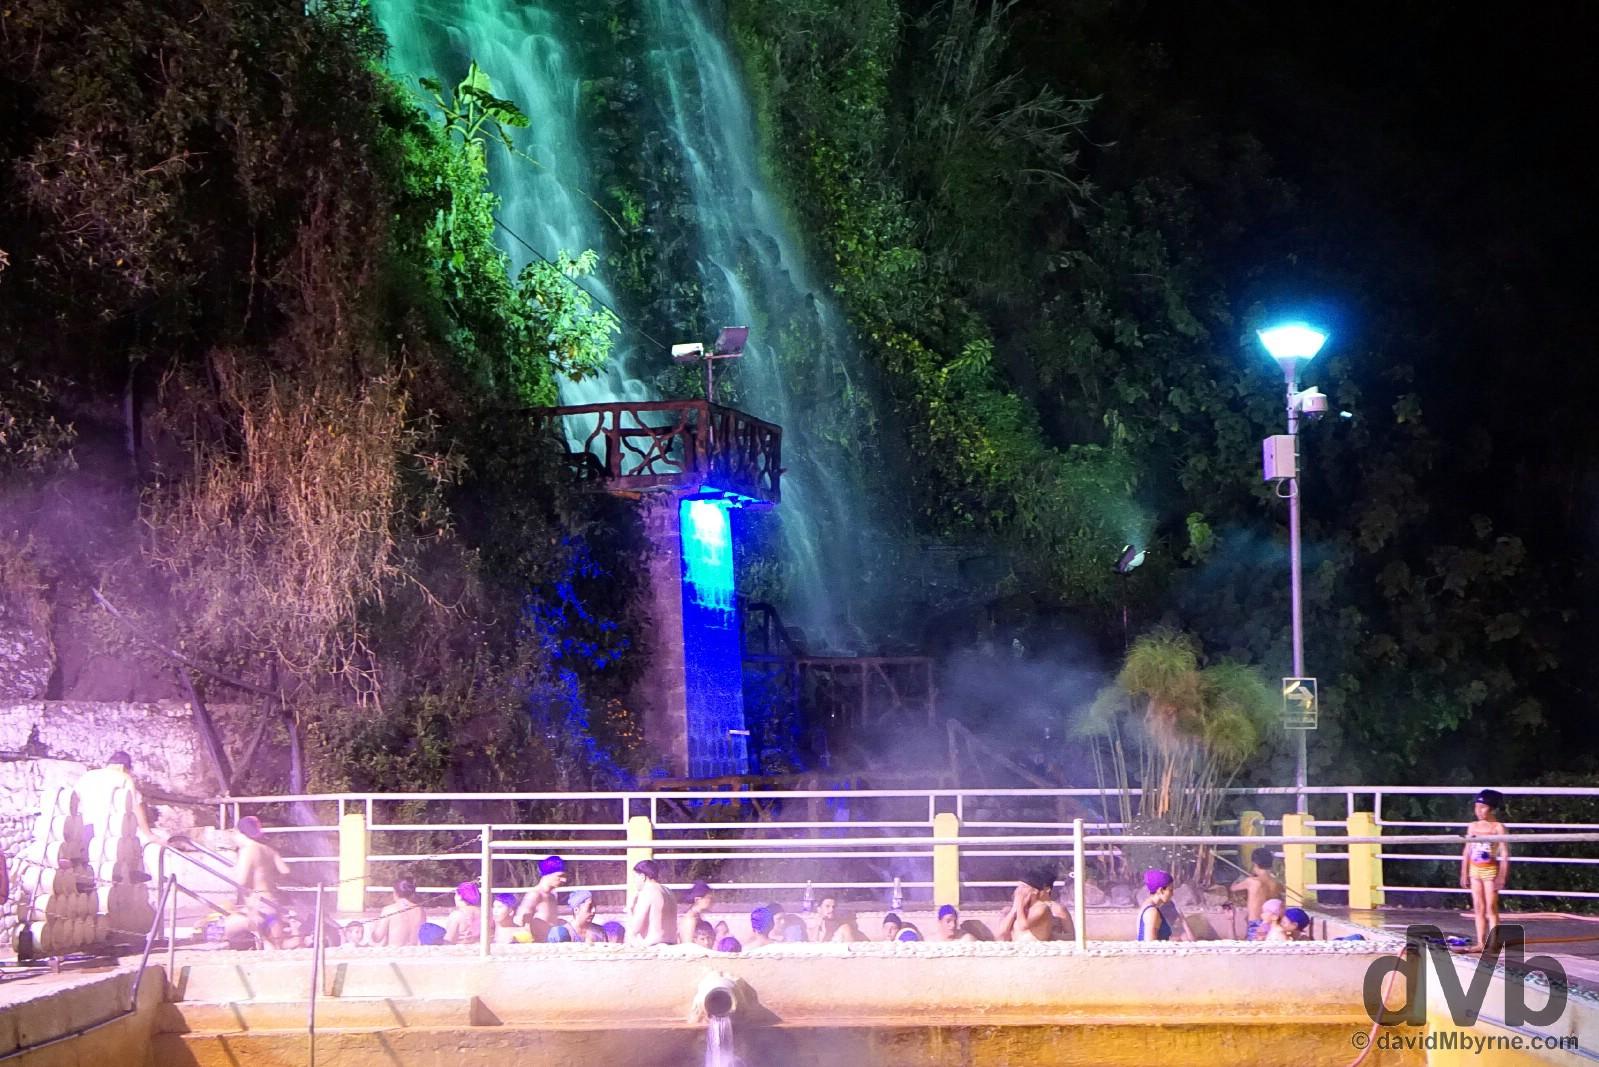 Night bathing at the Piscinas de la Virgen near the base of the Virgen waterfall in Banos, Ecuador. July 9, 2015.